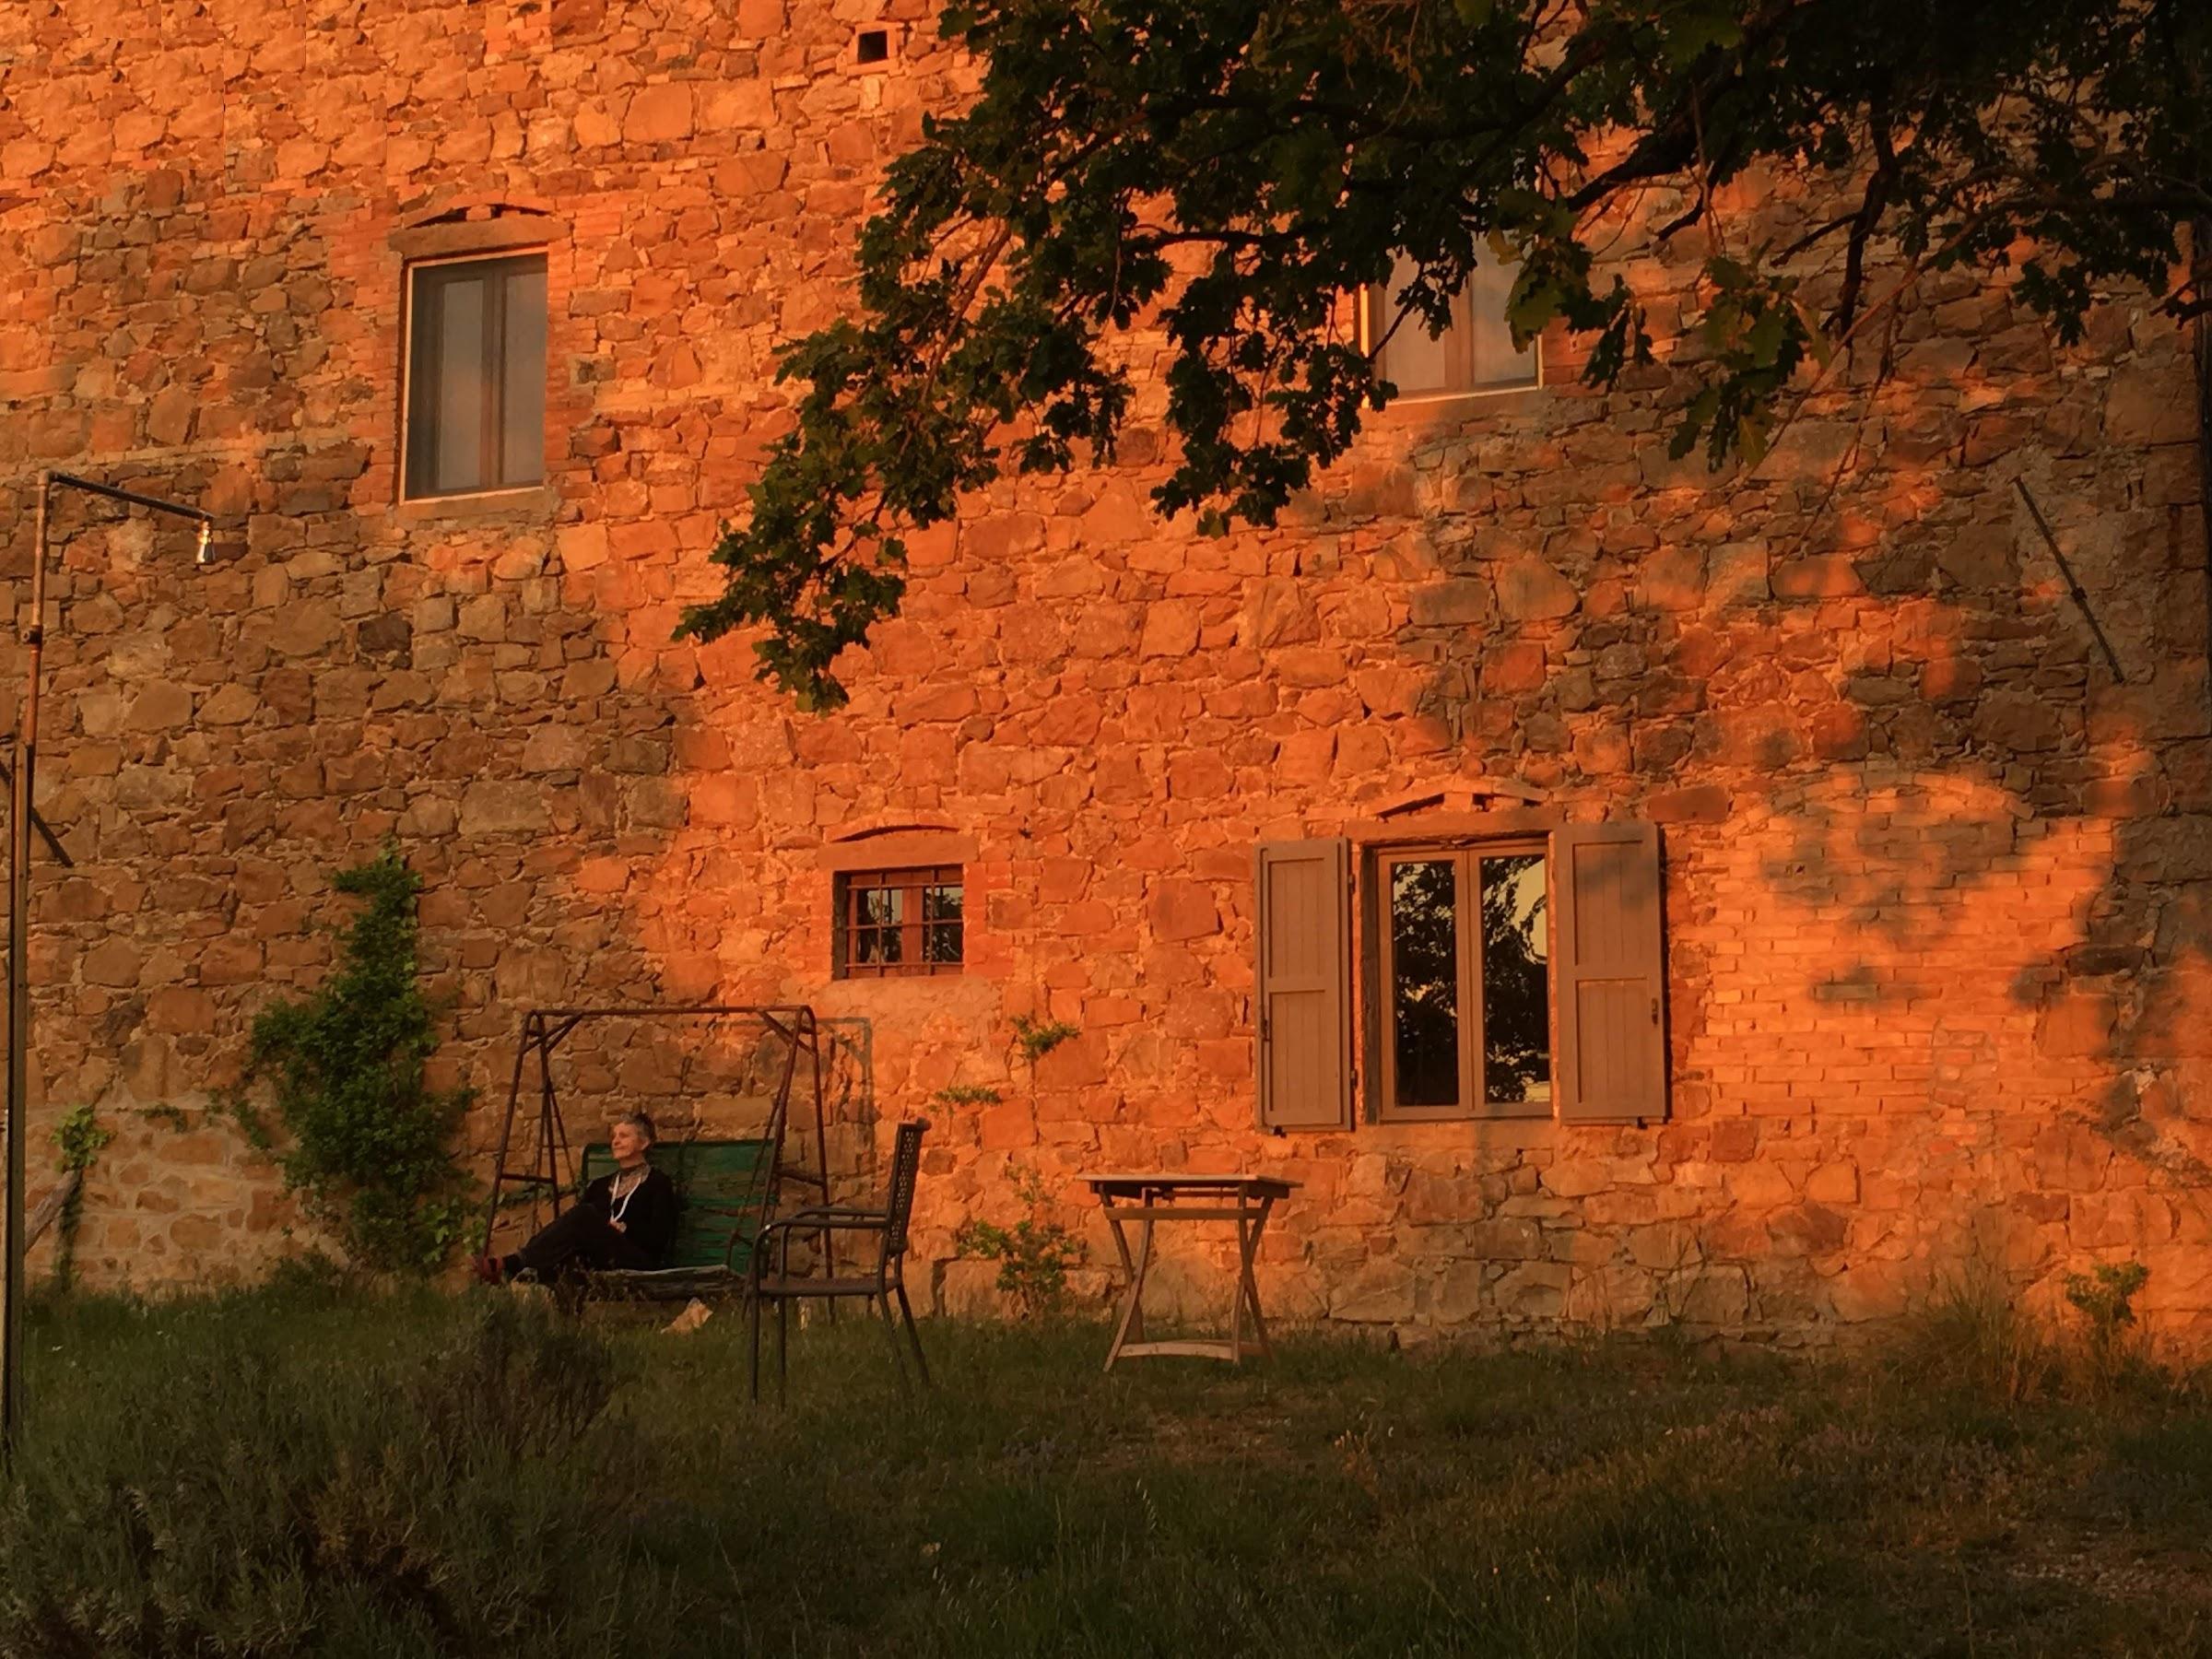 Thegolden lightand magic atmosphere of the Tuscan Maremma